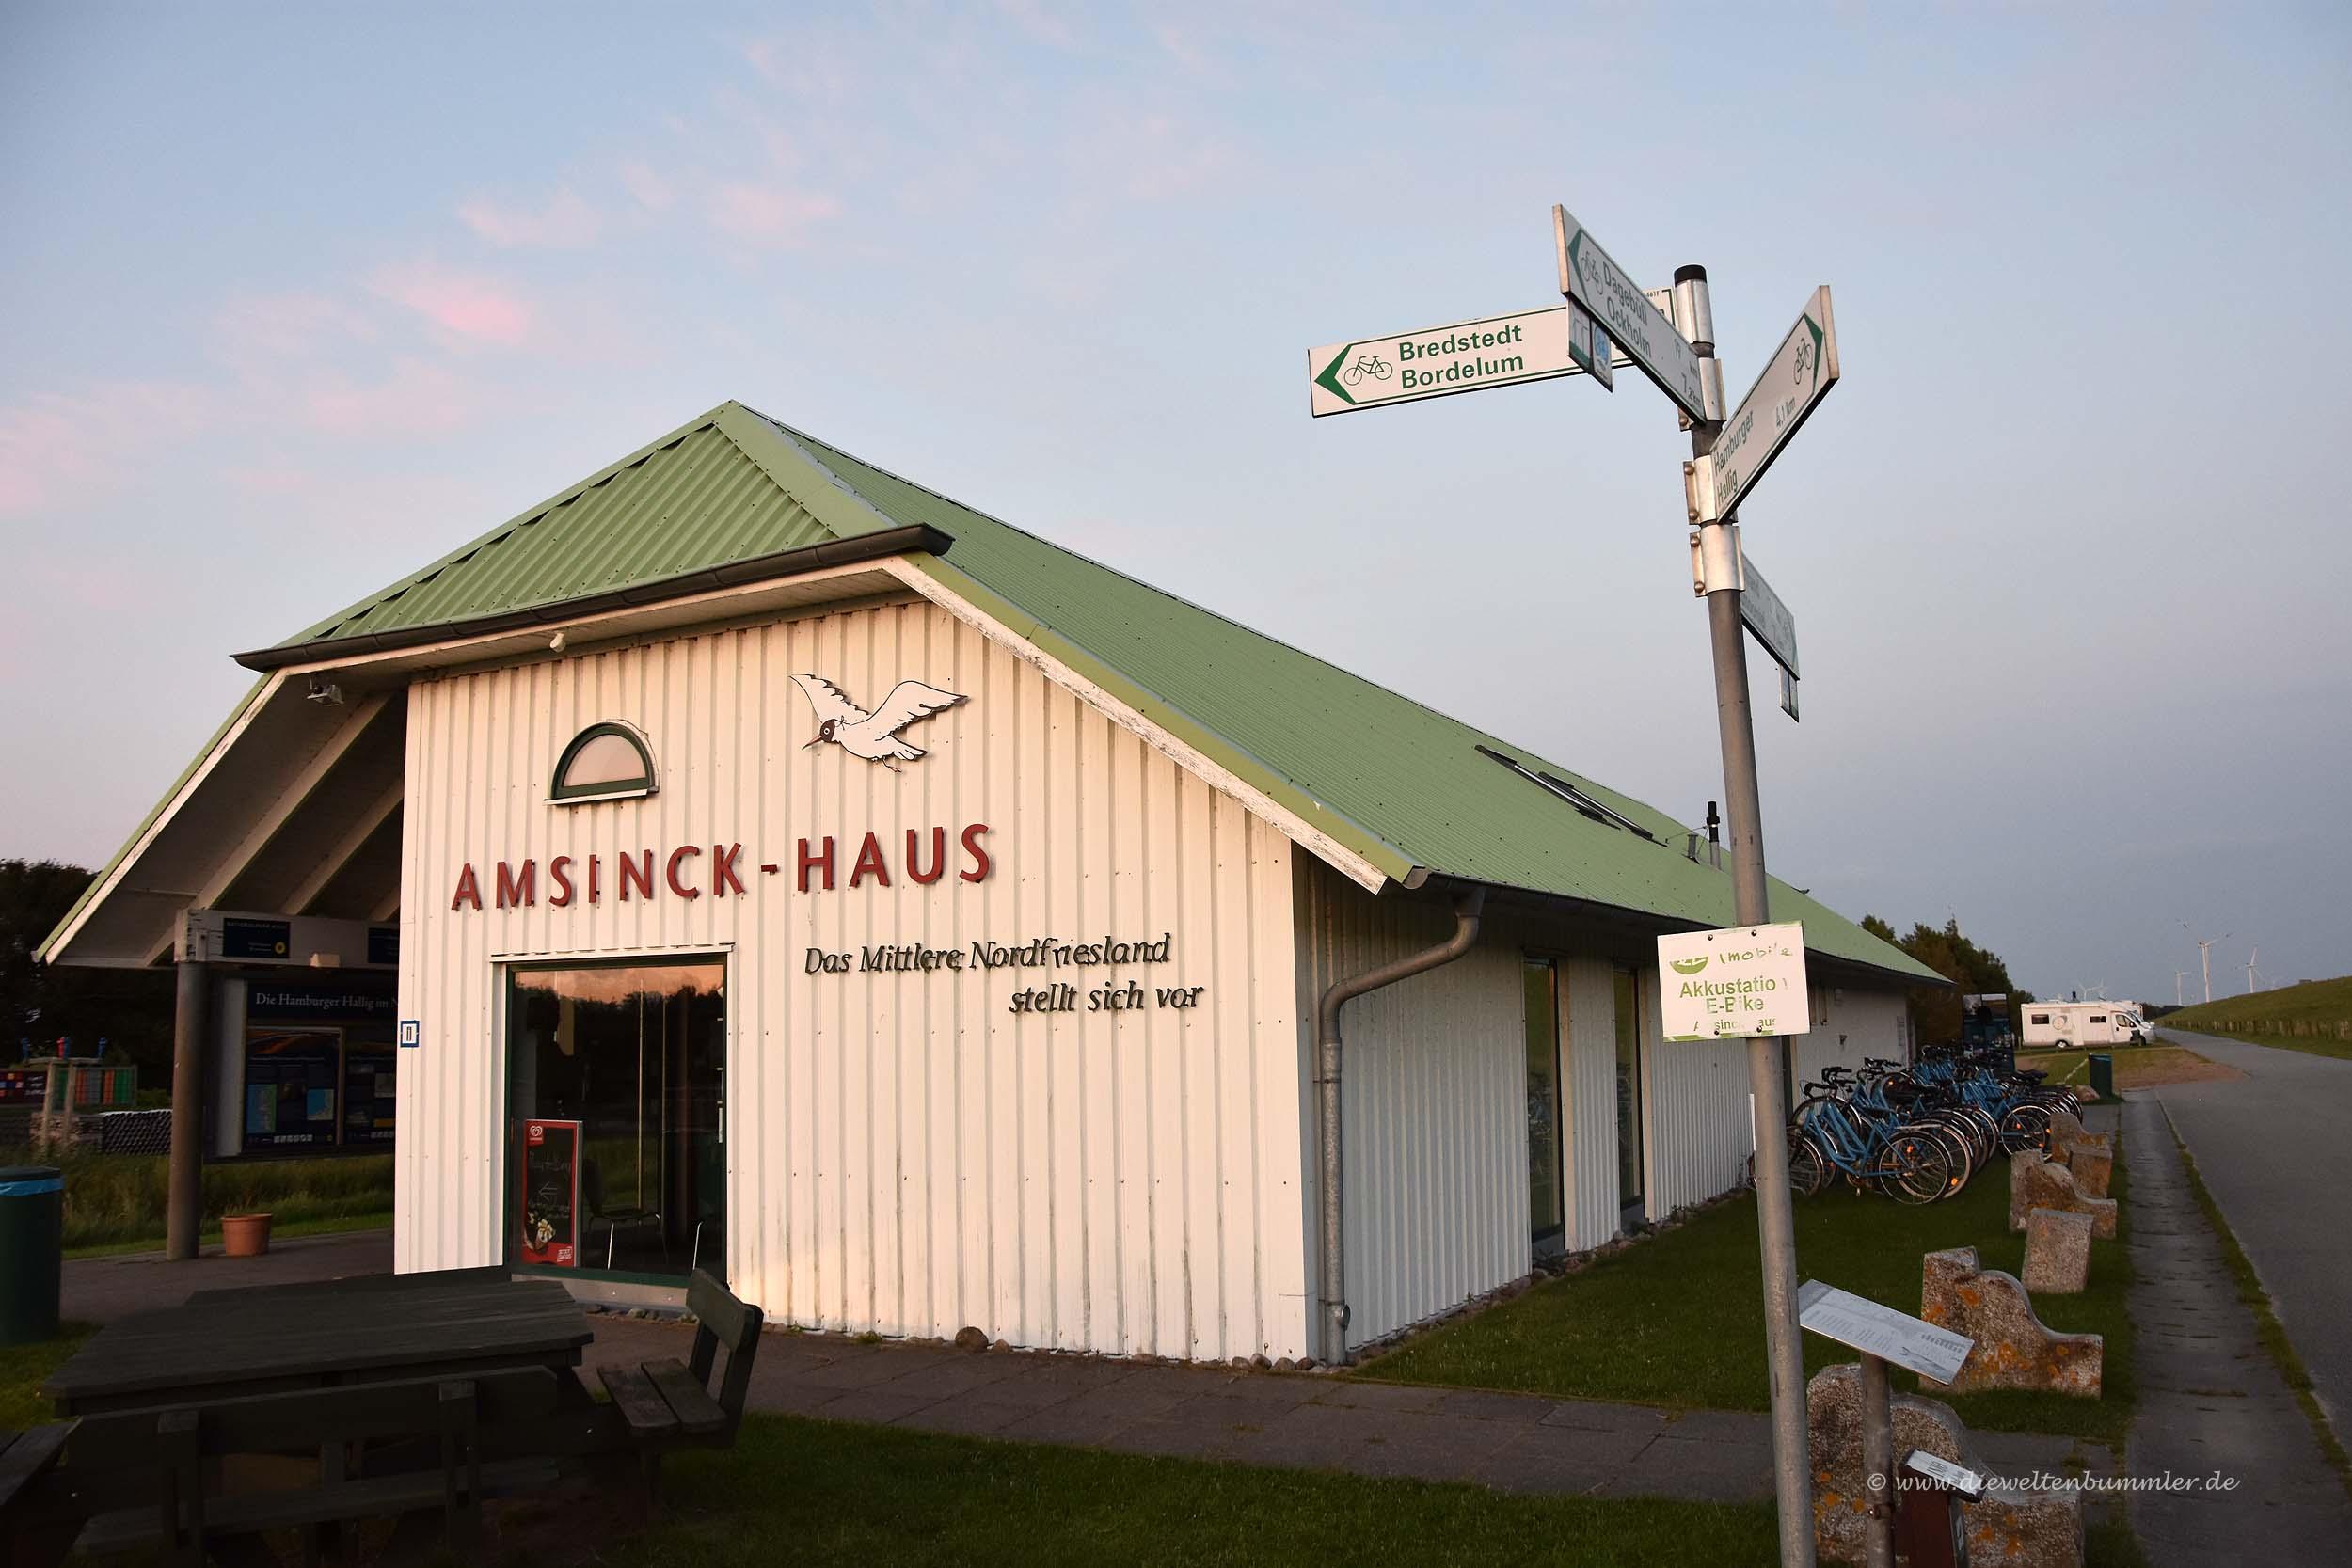 Amsinck-Haus hinter dem Deich